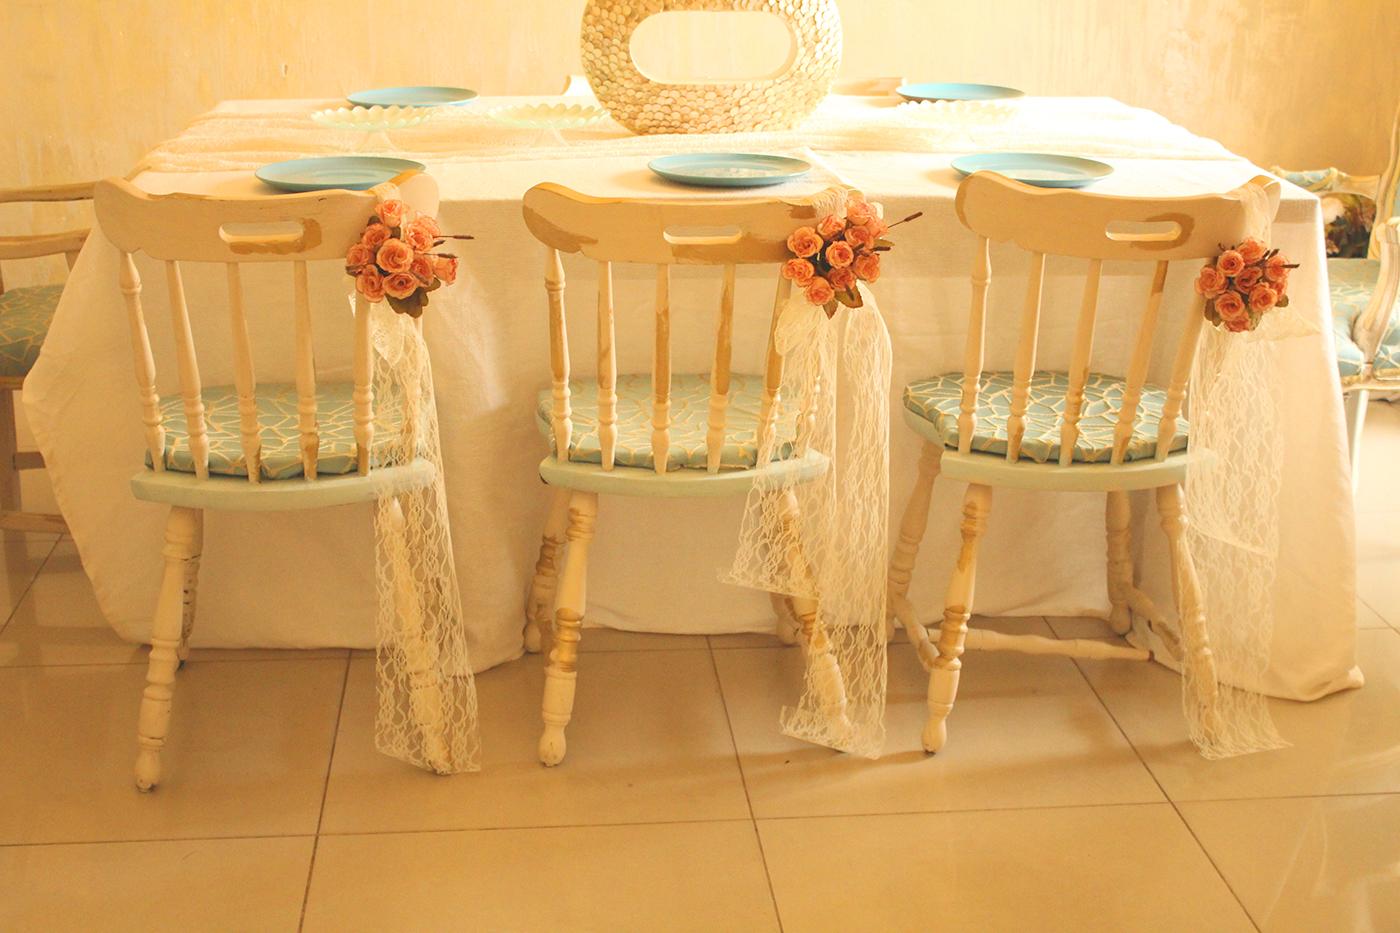 IMG 8088 - חידוש כסאות לפינת אוכל בסלון